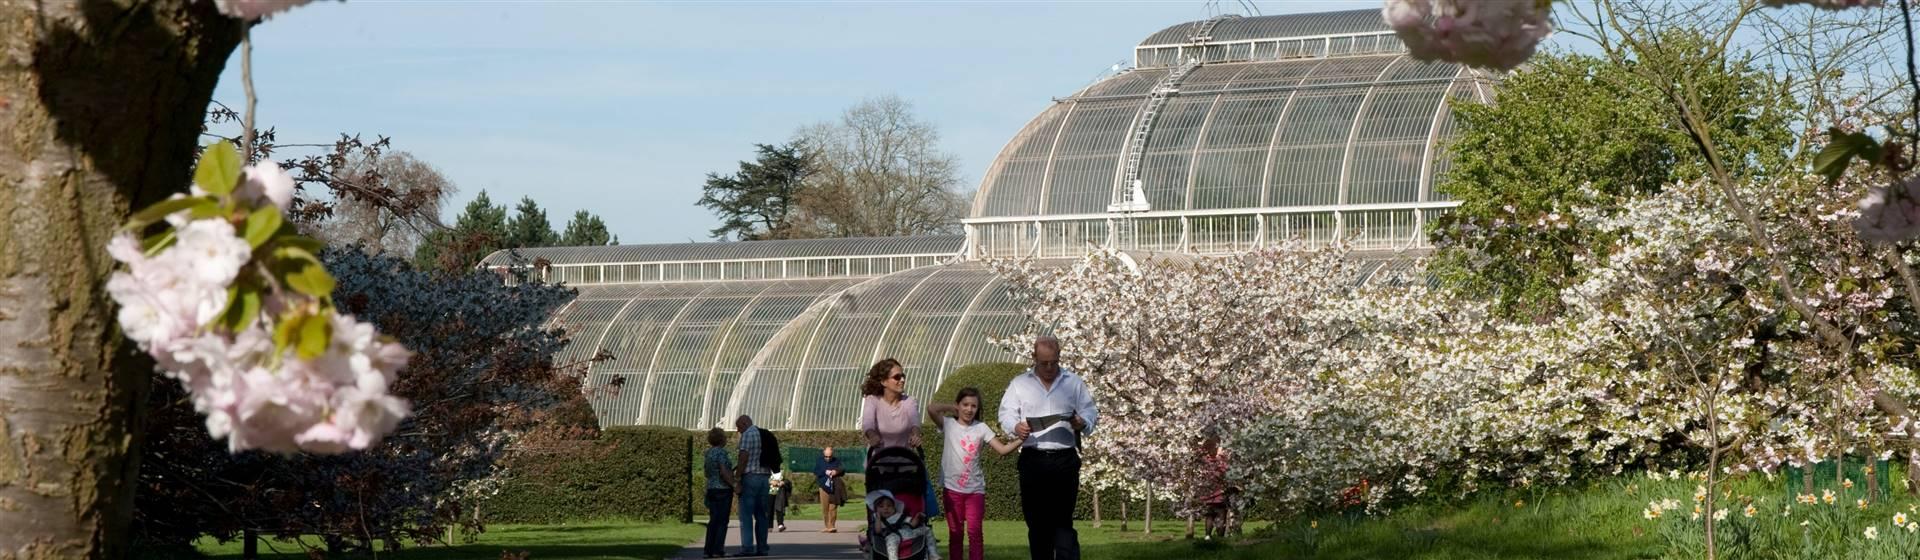 Buckingham Palace & Kew Gardens